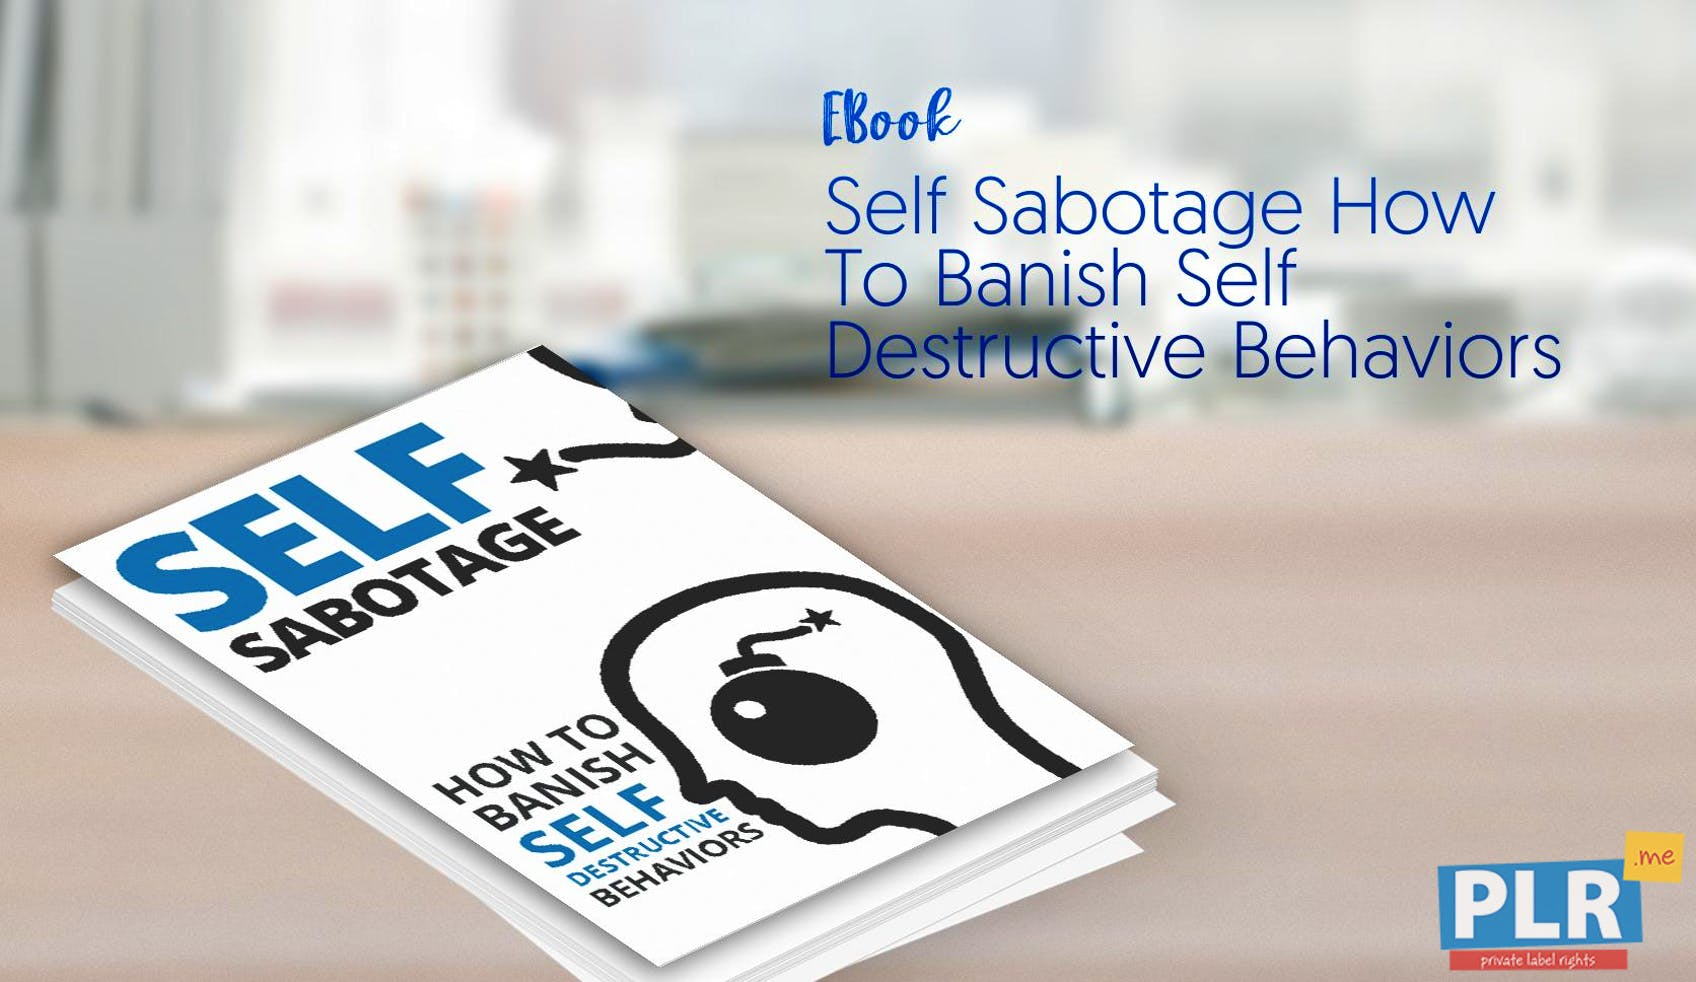 Self Sabotage How To Banish Self Destructive Behaviors